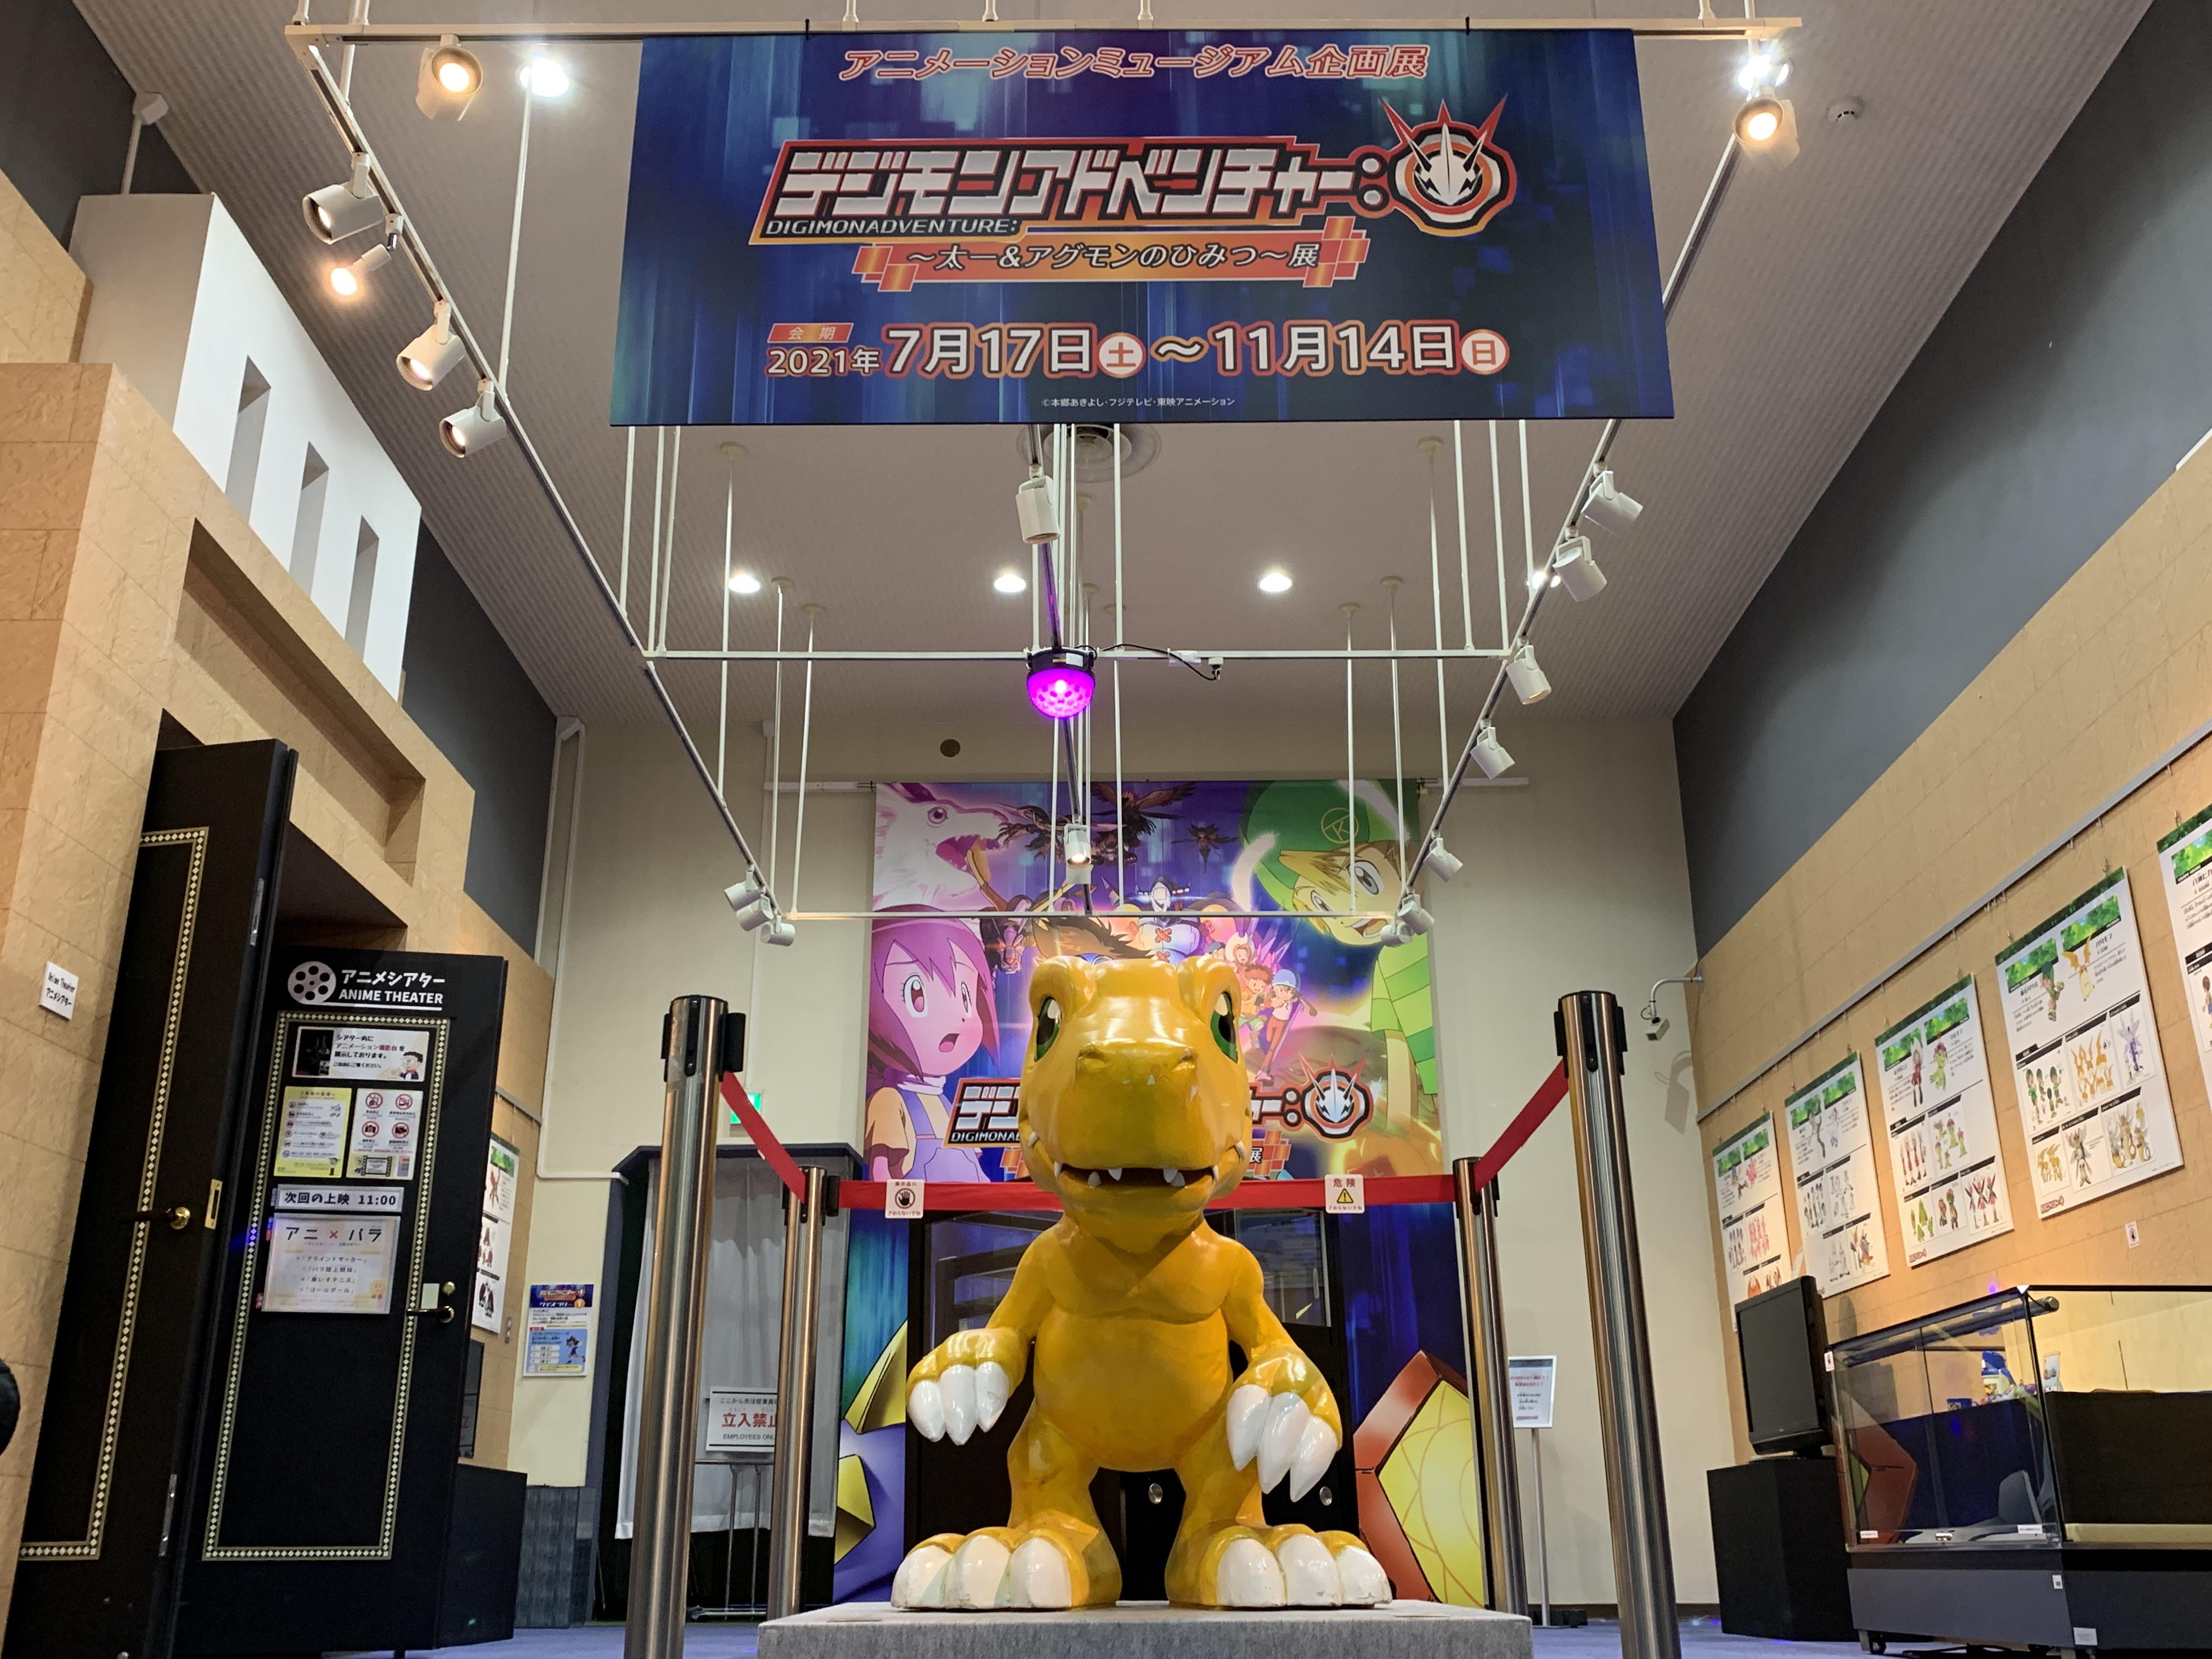 exhibition2_july17_2021.jpg